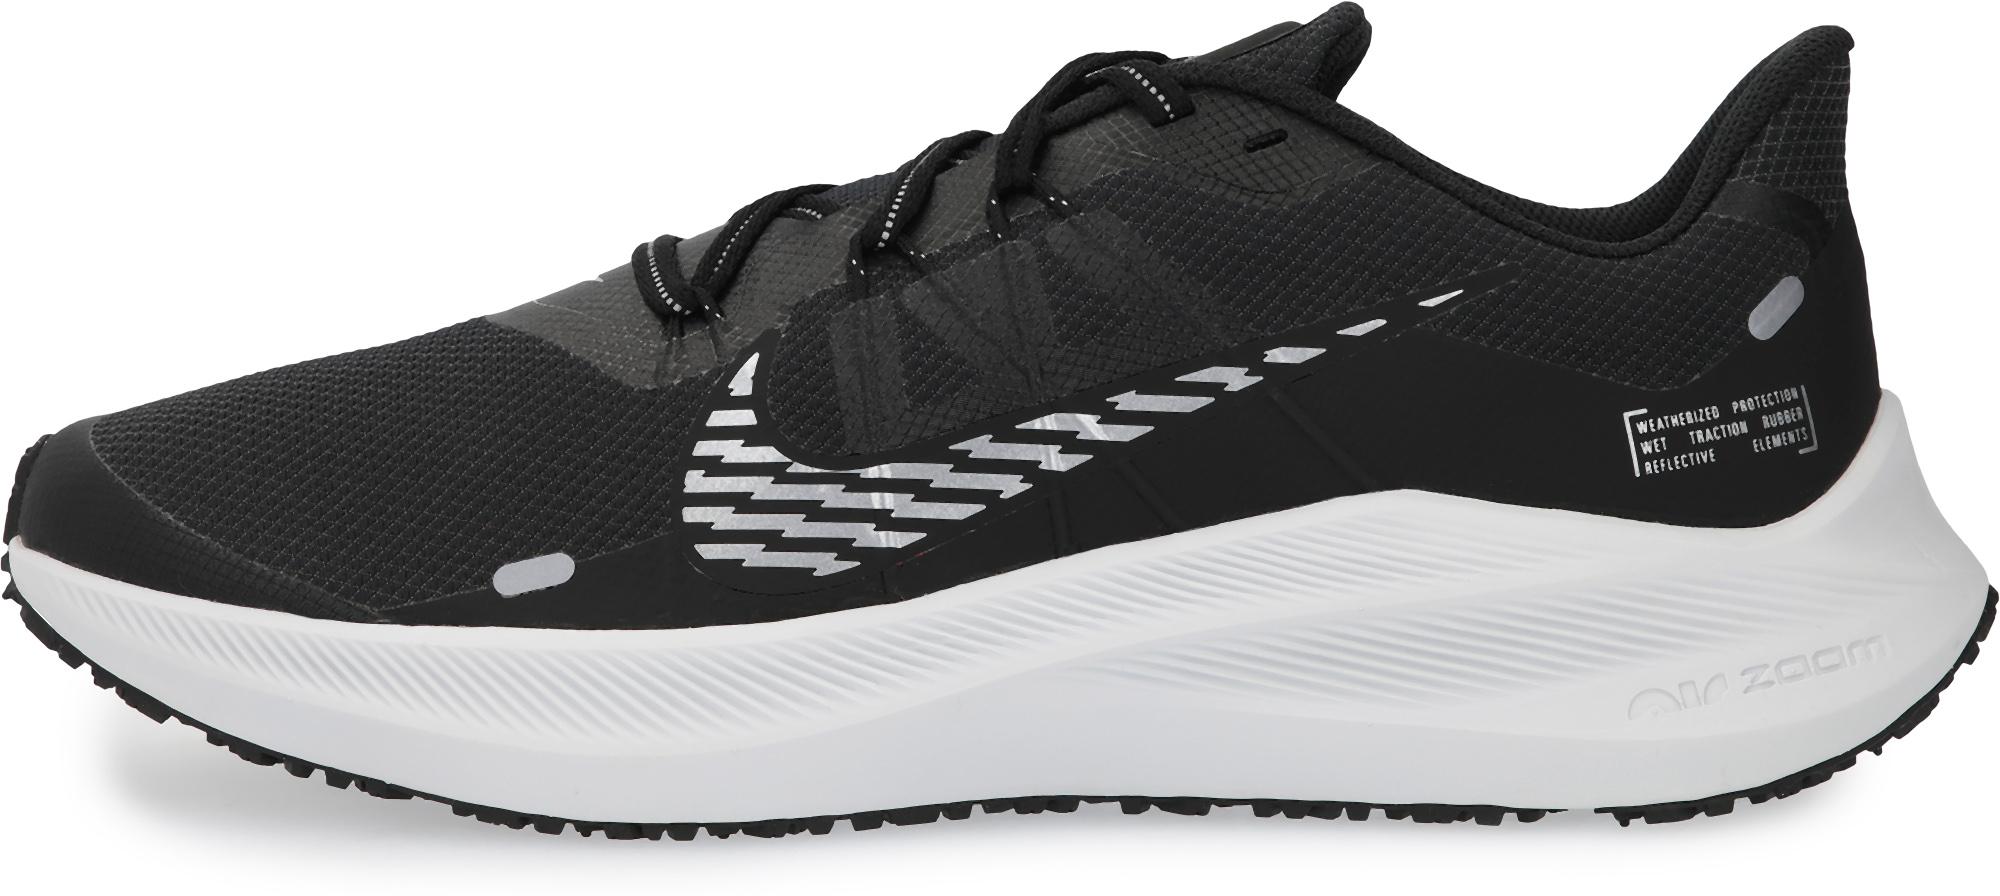 Nike Кроссовки мужские Nike Winflo 7 Shield, размер 43.5